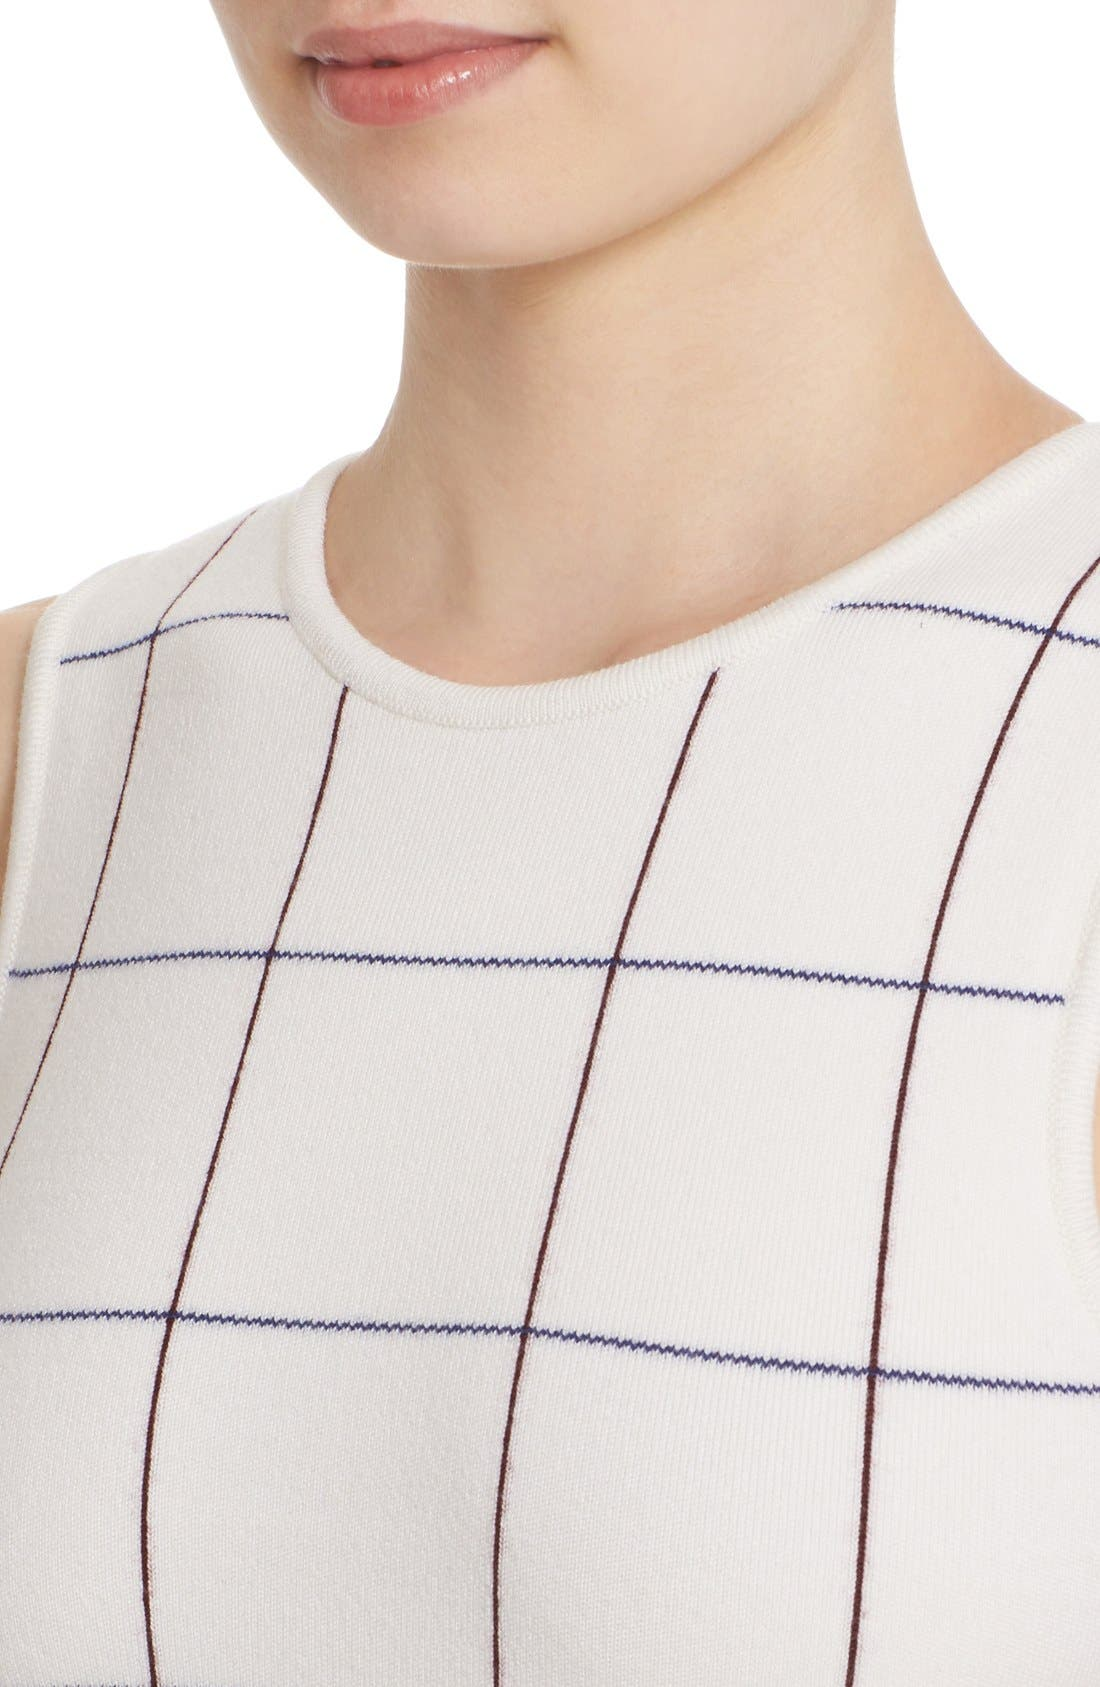 Victoria Beckham Intarsia Check Sheath Dress,                             Alternate thumbnail 5, color,                             100